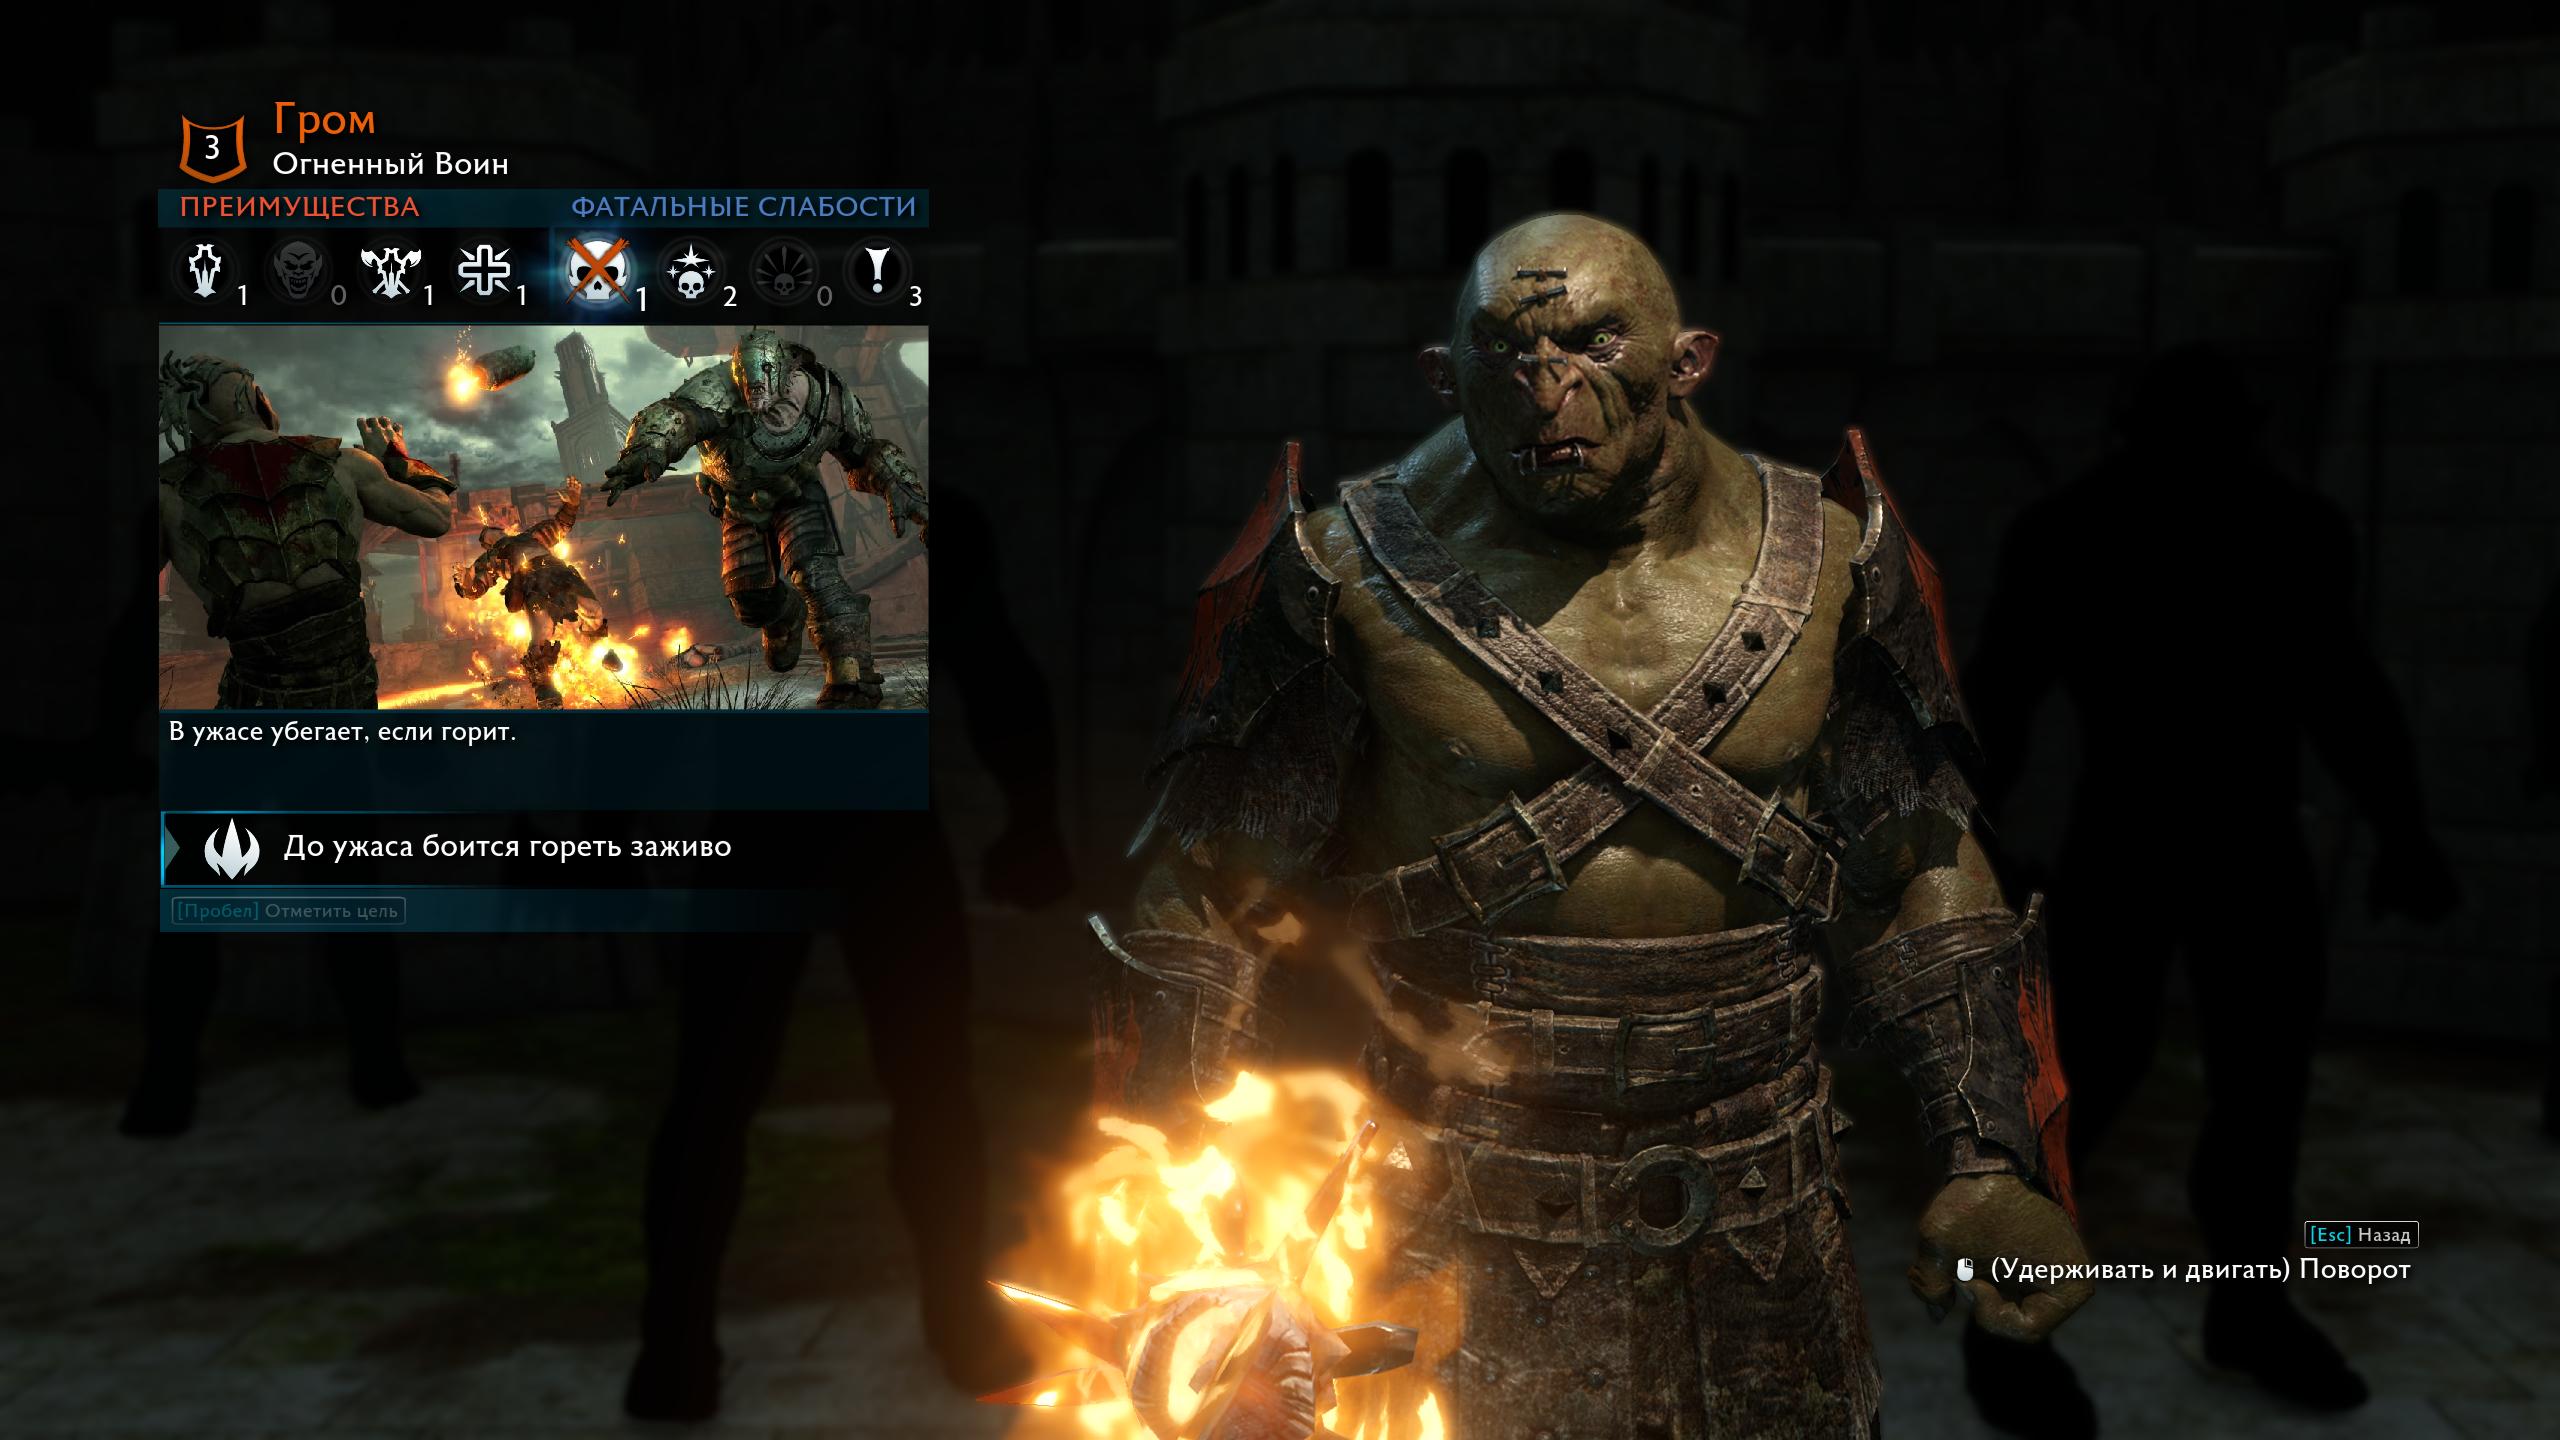 Гром - Middle-earth: Shadow of War